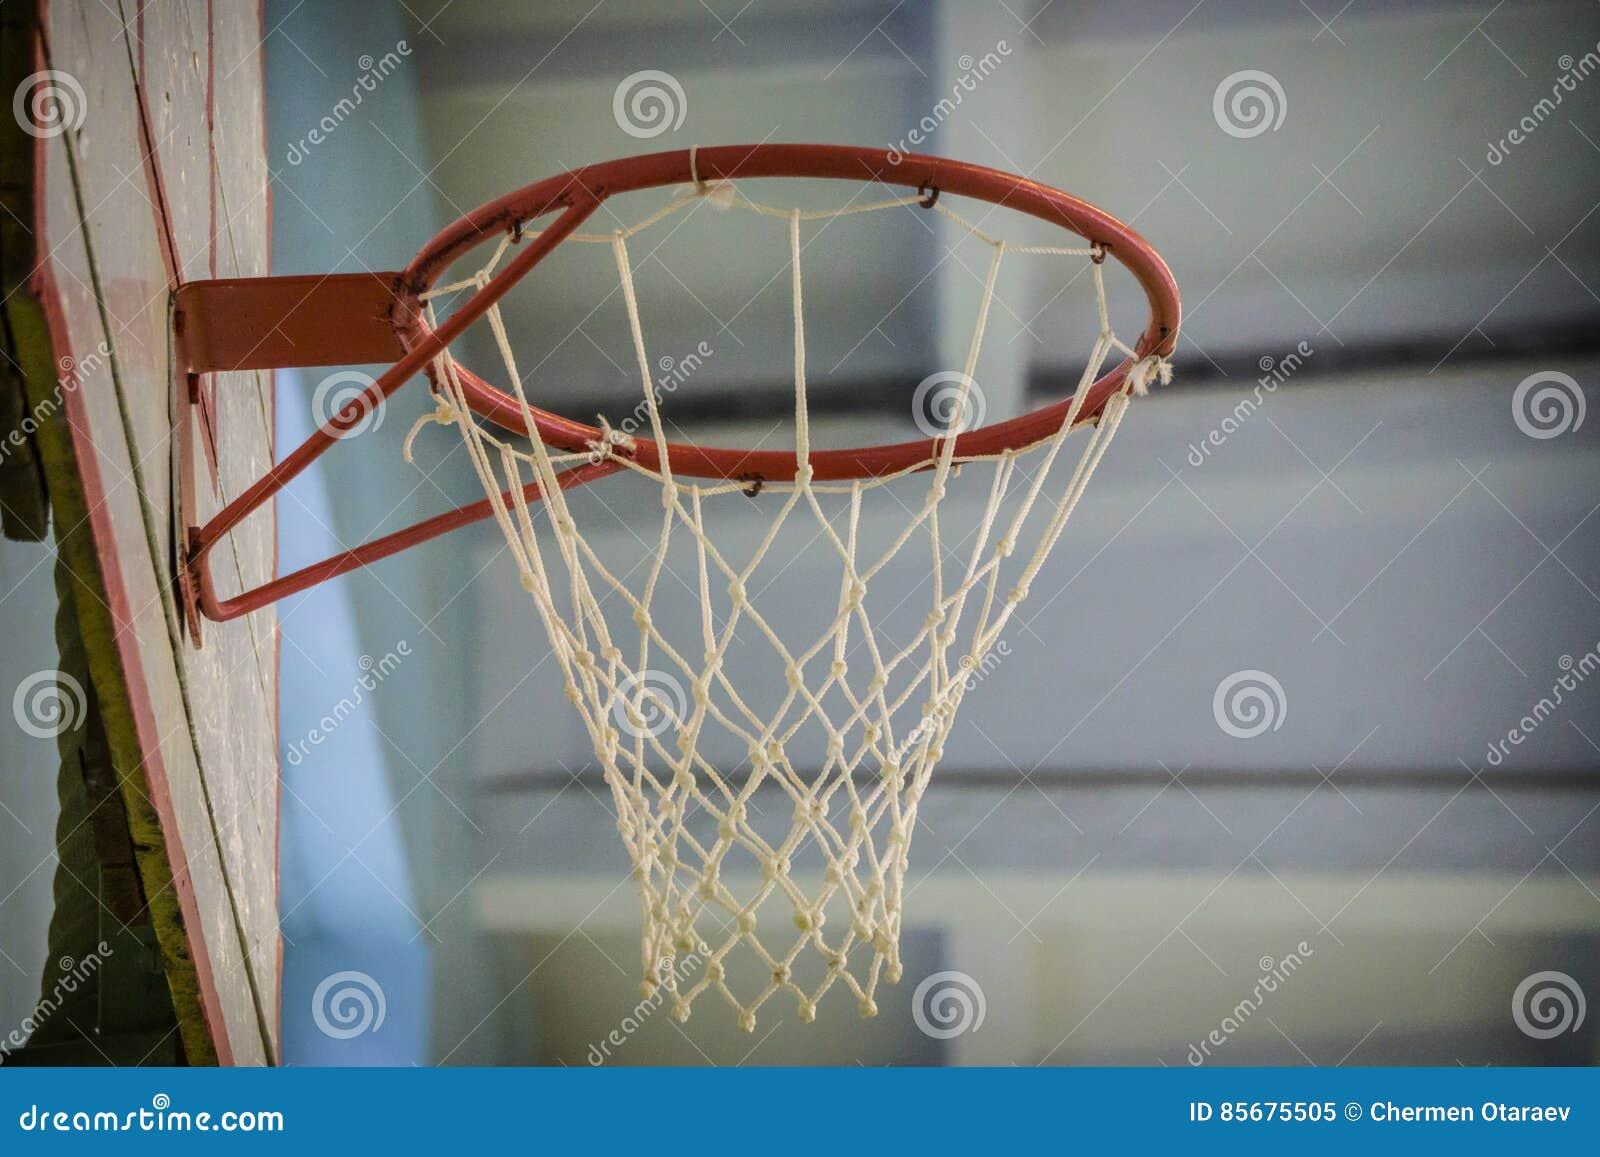 Old Indoor Basketball Hoop In Gym At School Stock Image - Image of ...